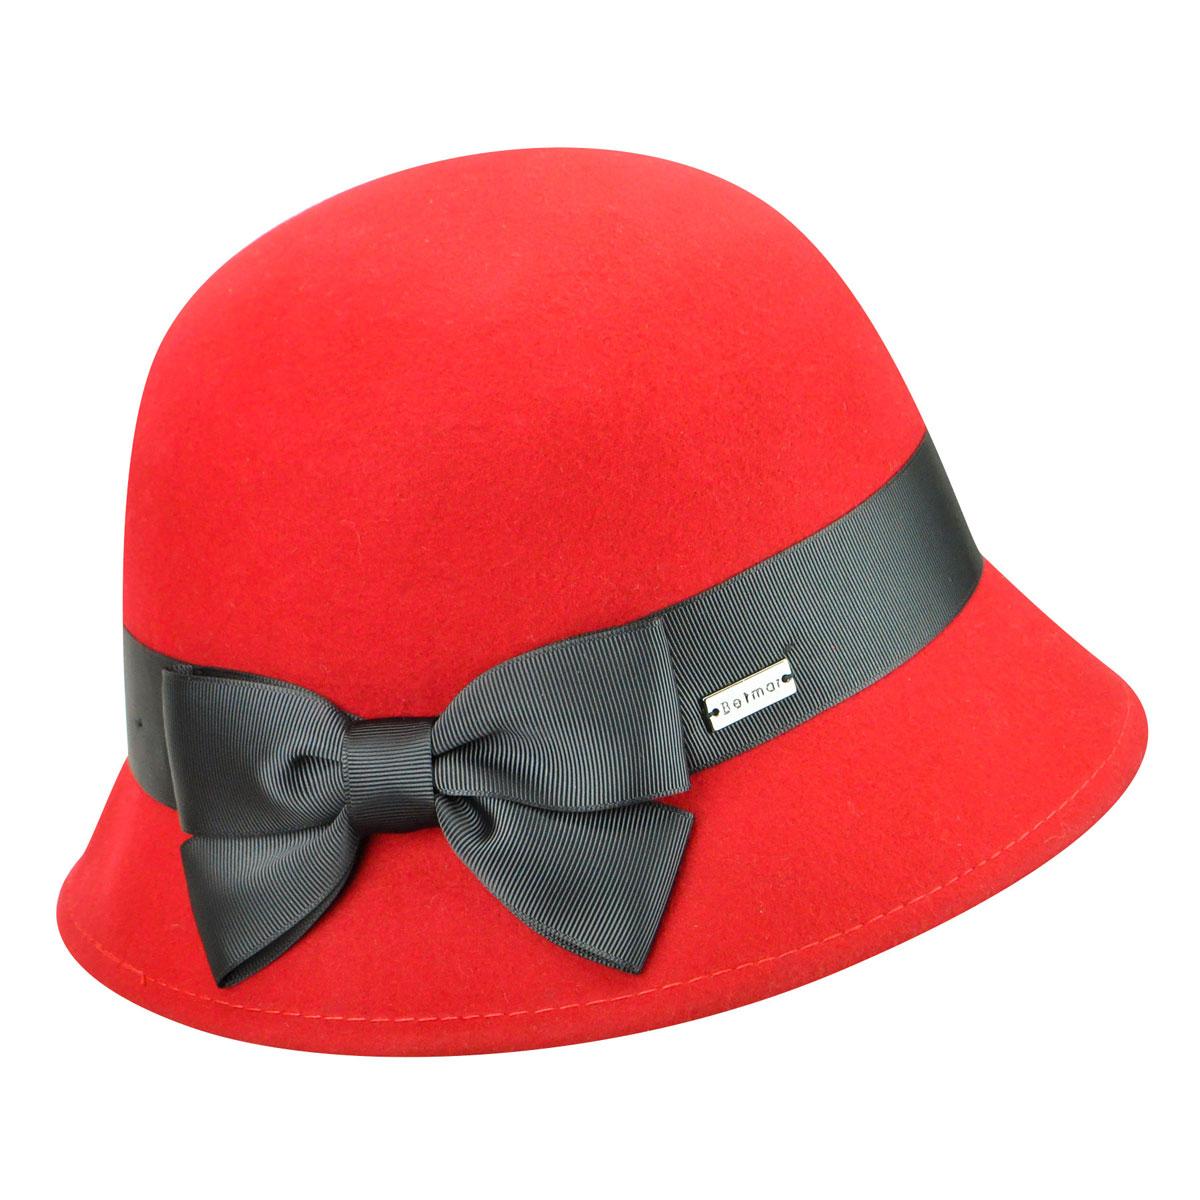 1920s Hat Styles for Women- History Beyond the Cloche Hat Emma Wool Felt Cloche $50.00 AT vintagedancer.com